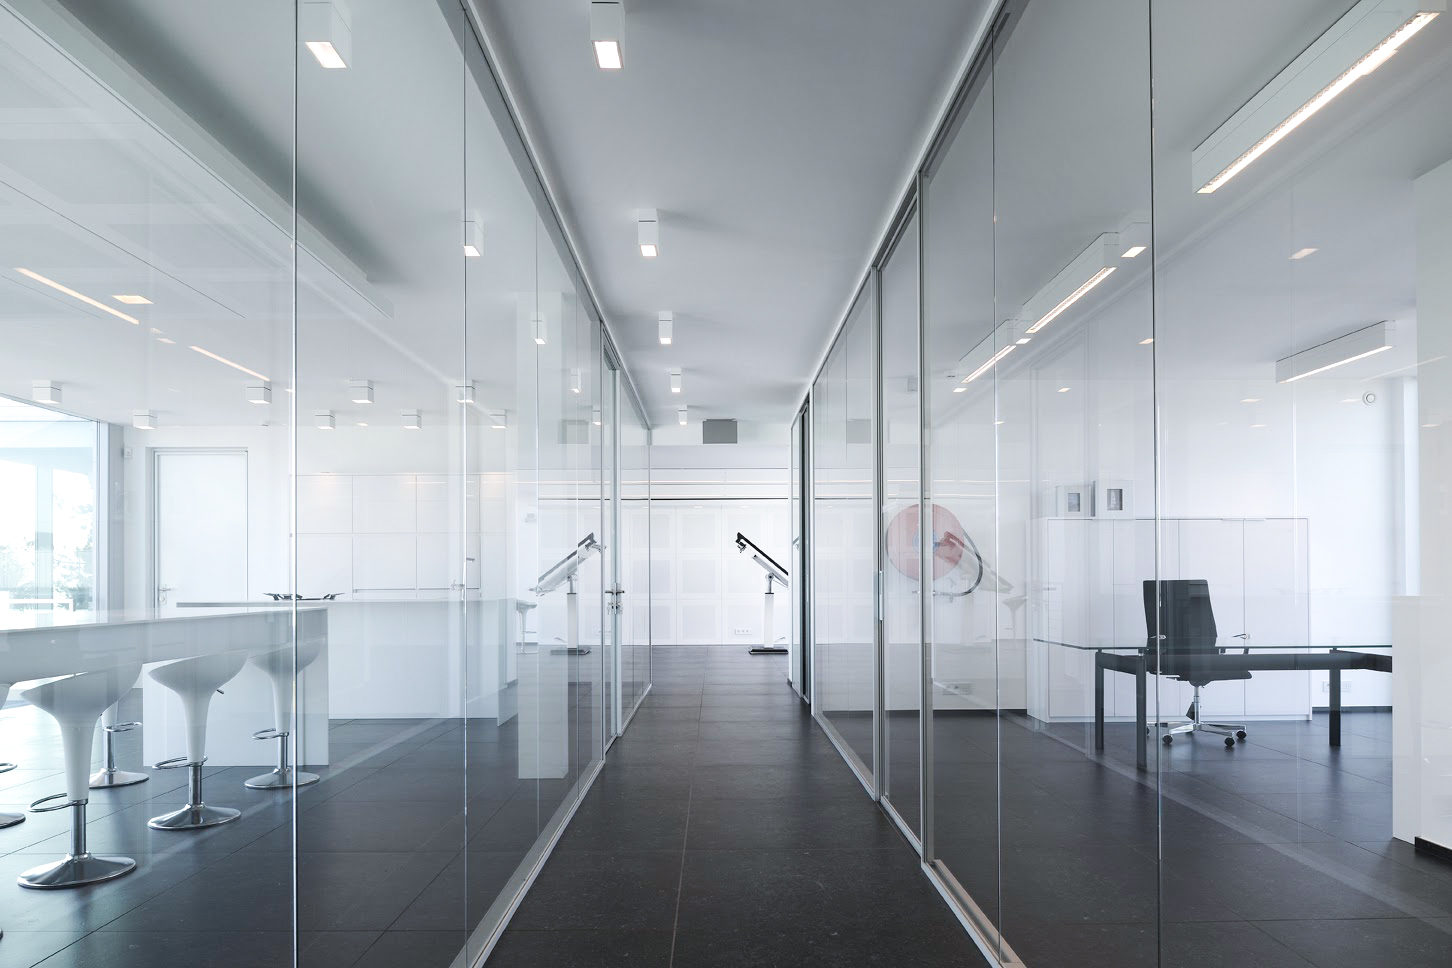 modern office hallway with big glass windows